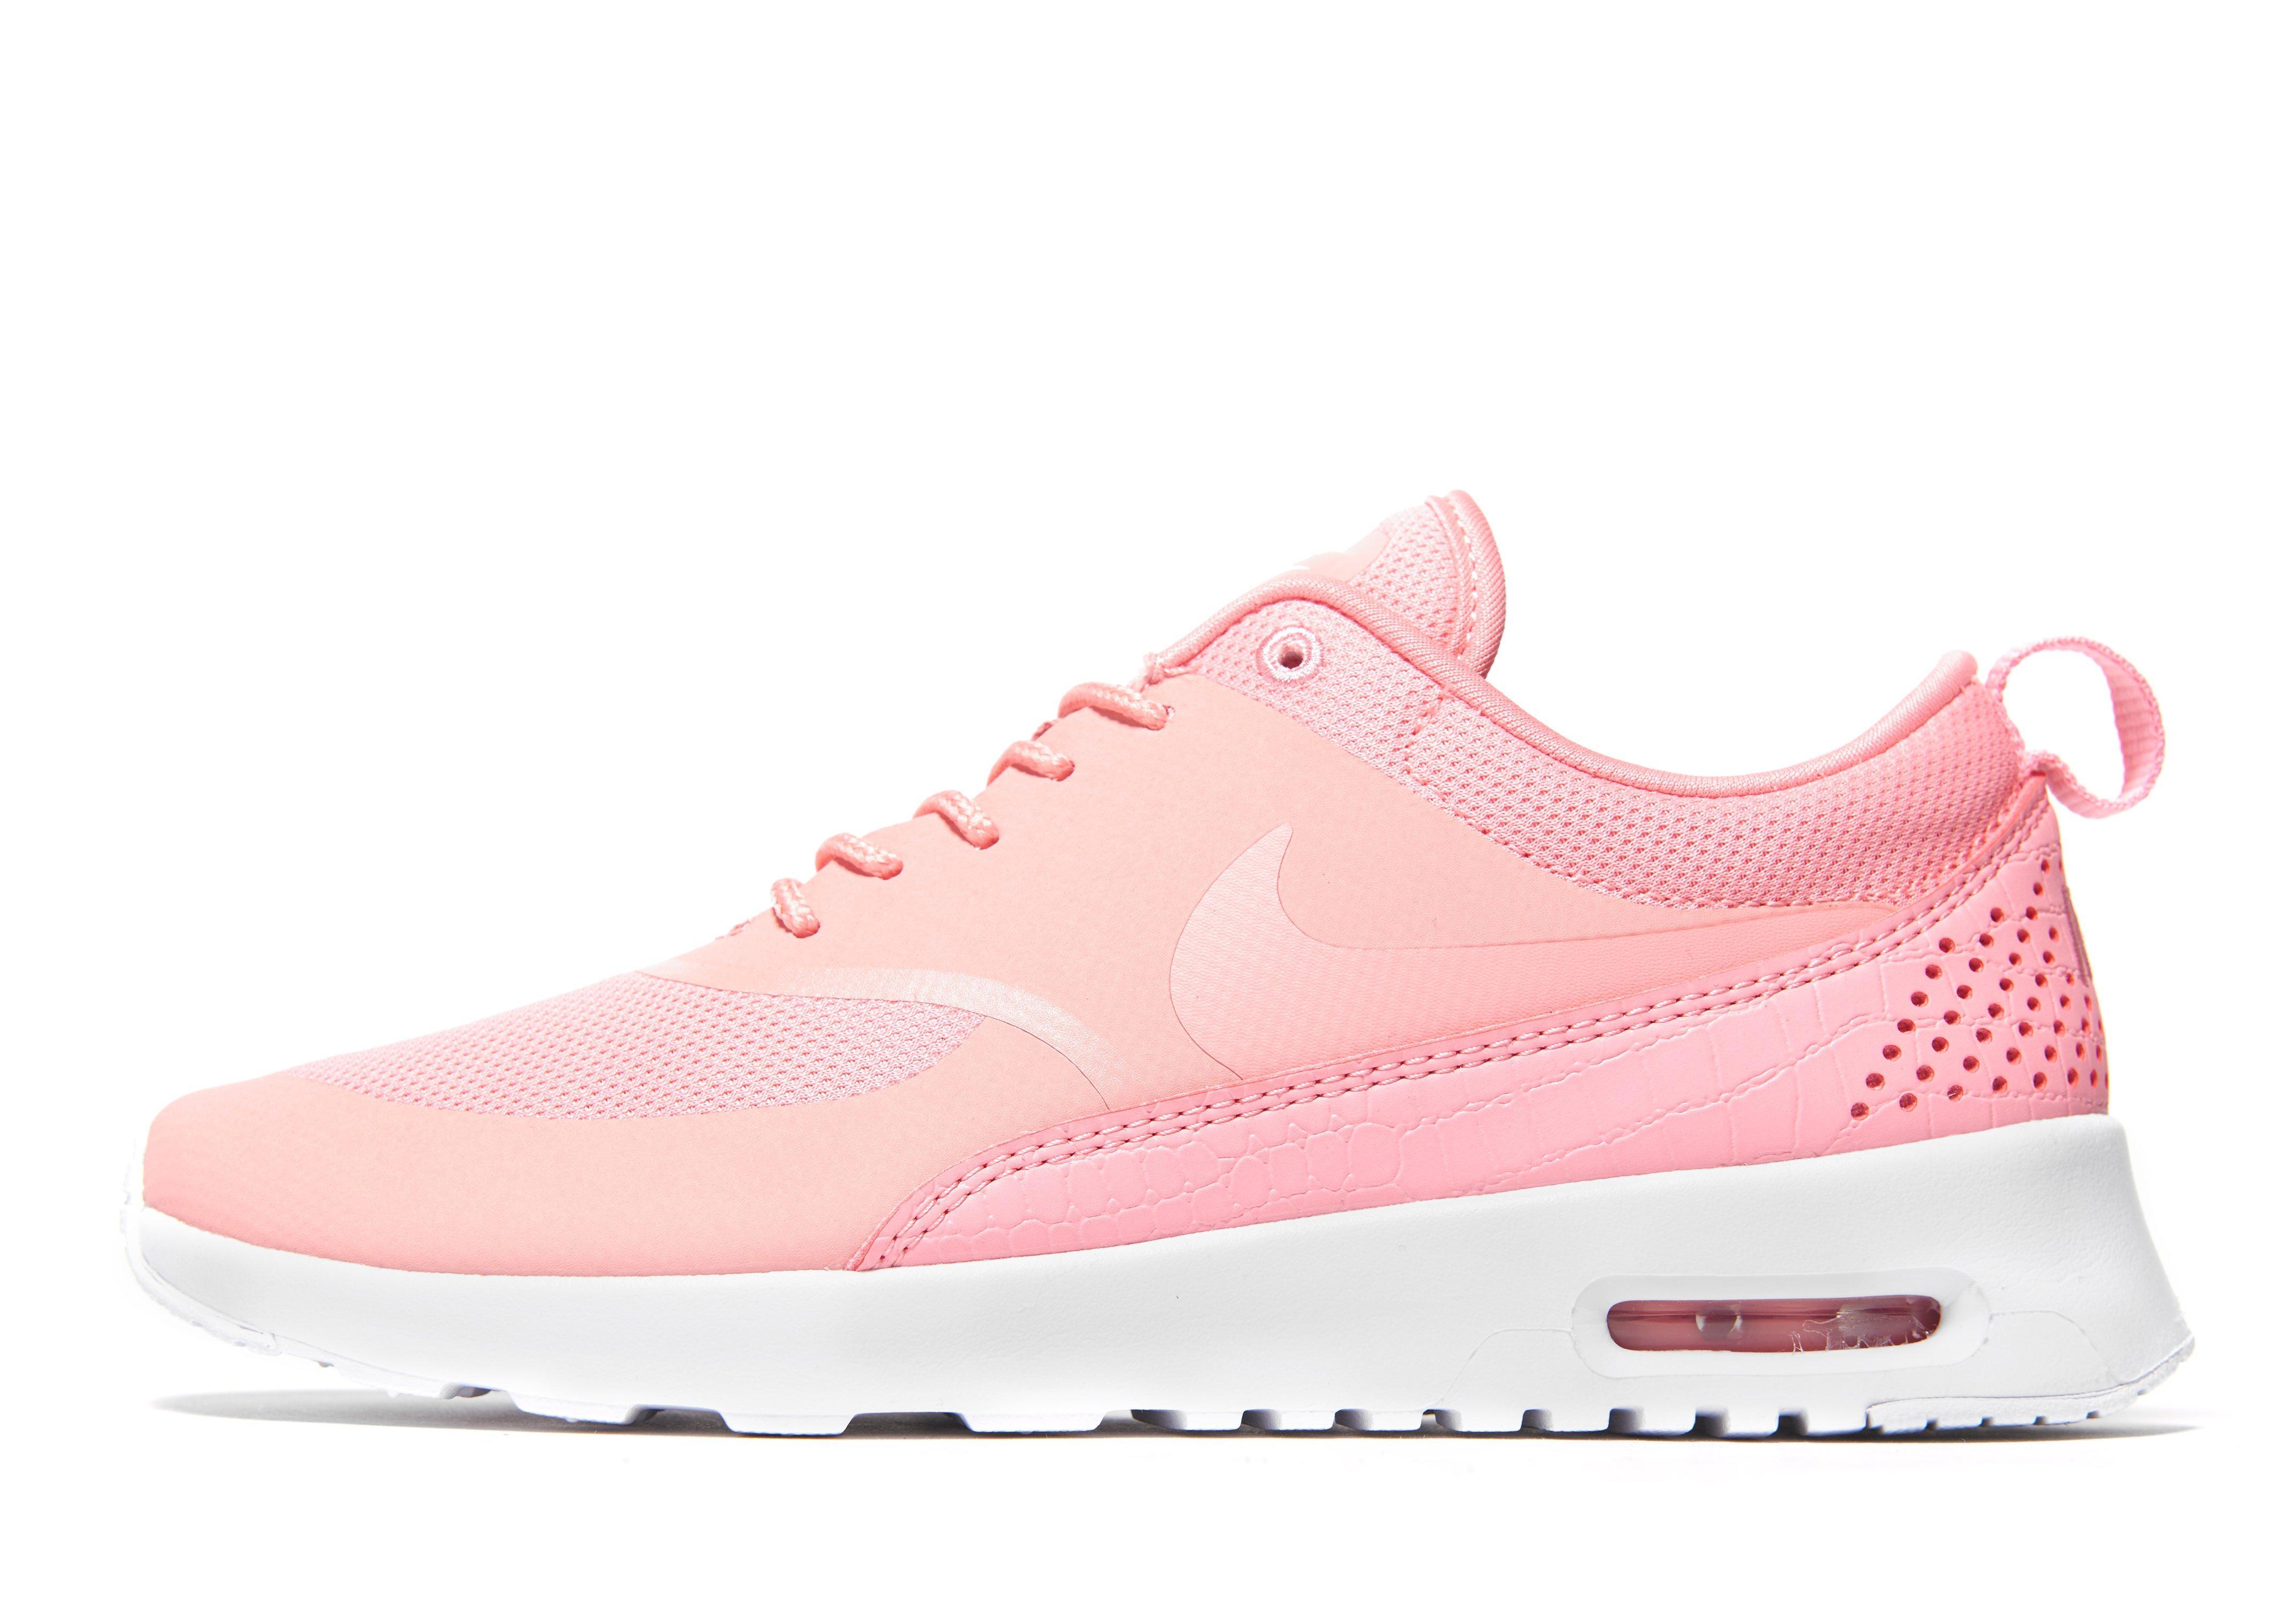 Femmes Nike Air Max Rose Formateurs De Thea Chaussures